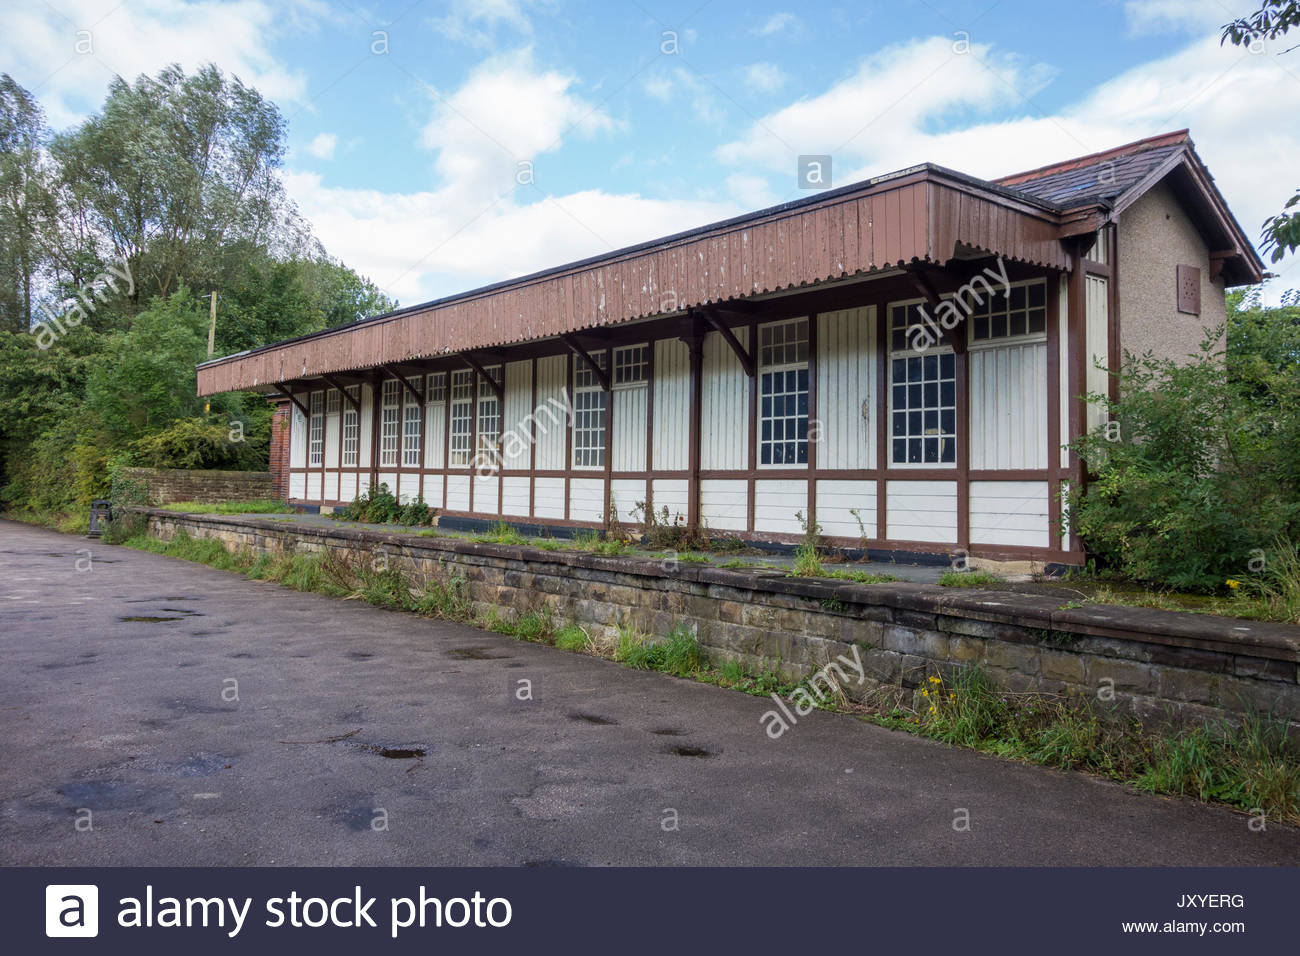 The dismantled railway and Railway Station at Halton, near Lancaster, UK - Stock Image